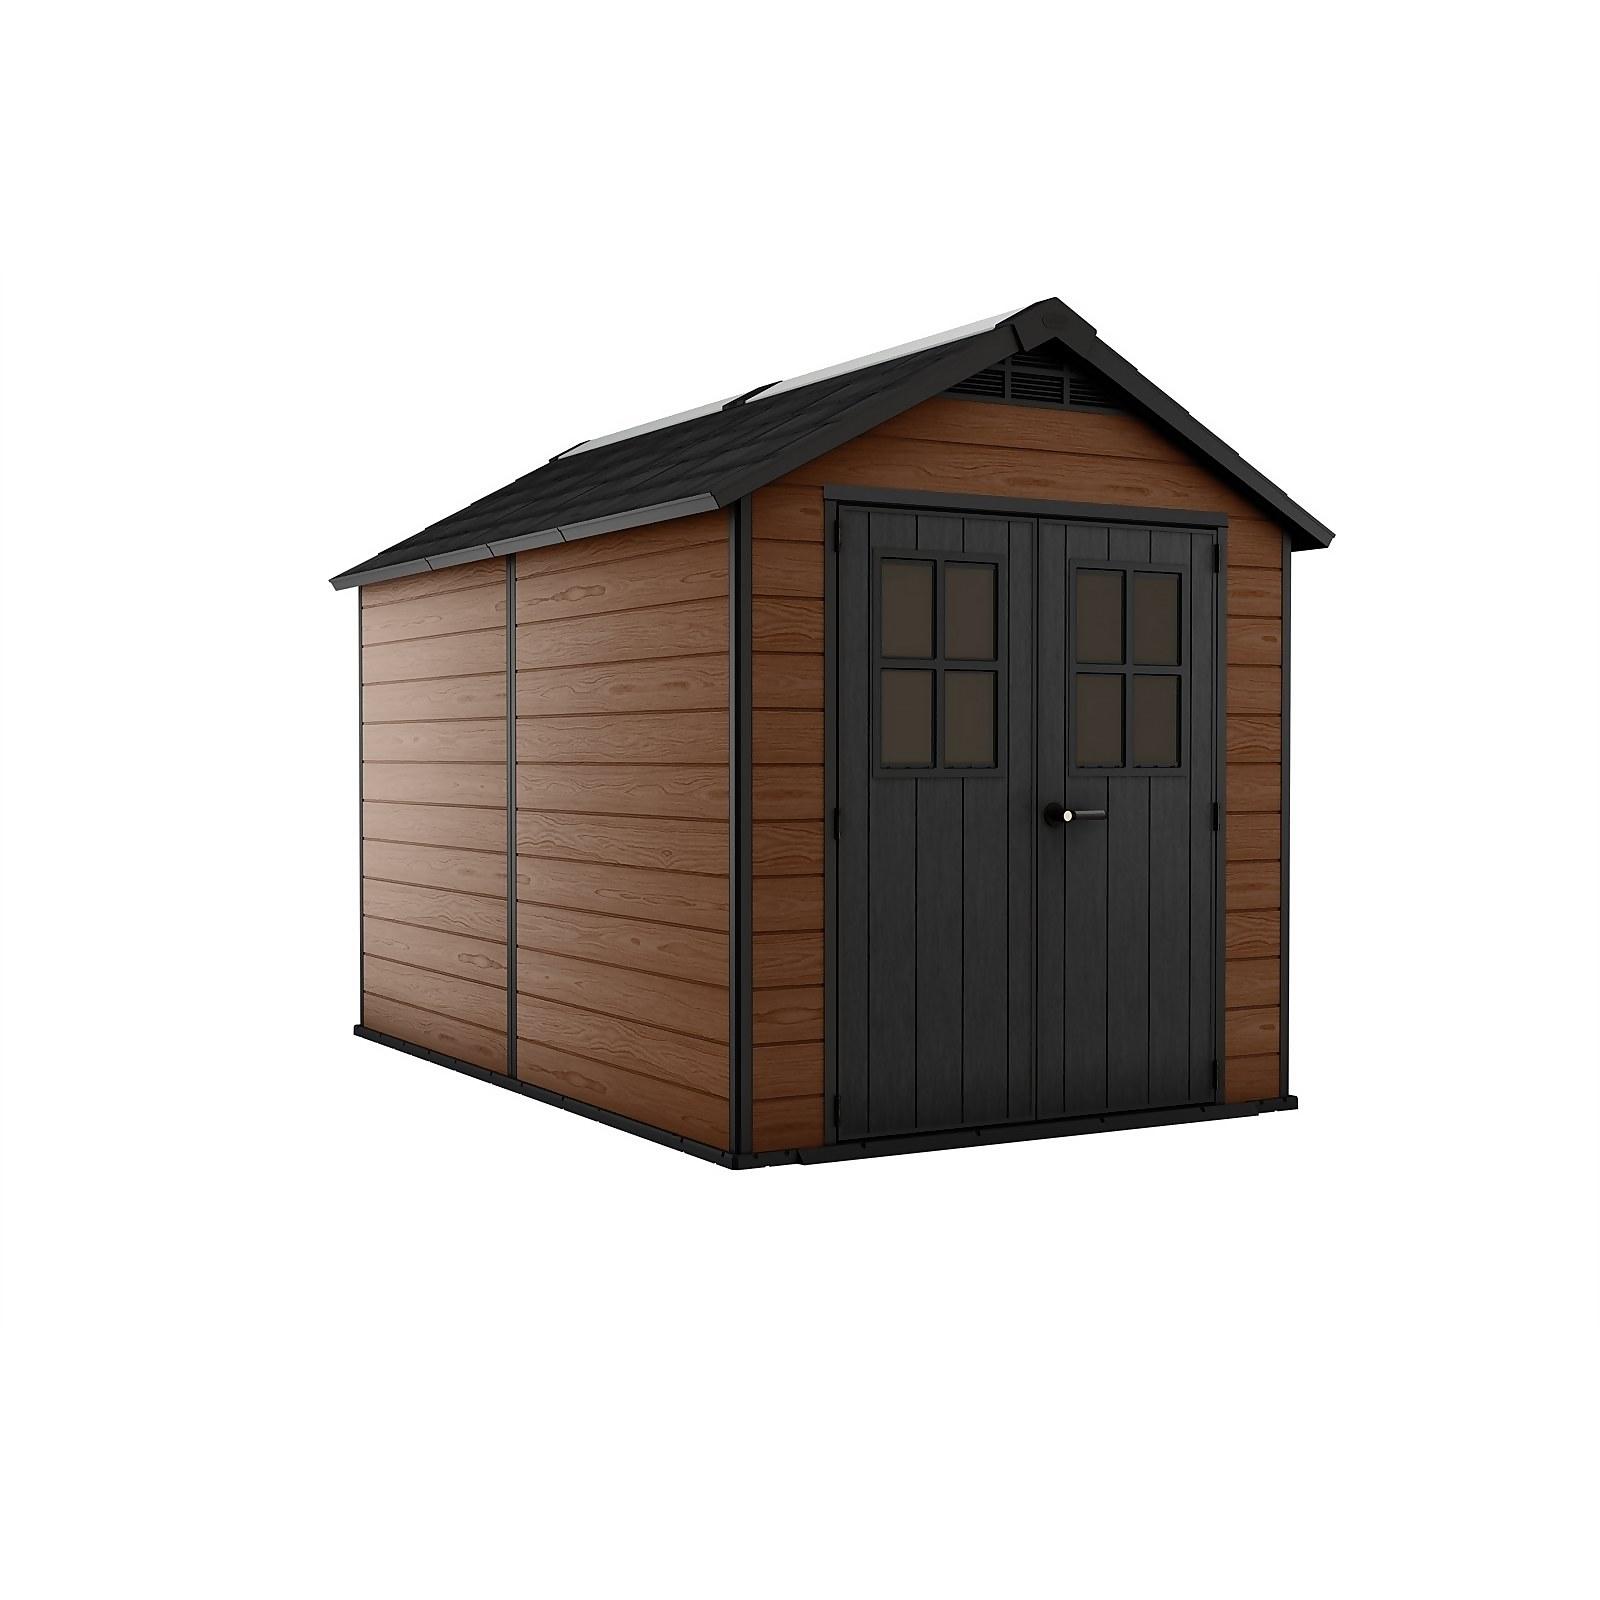 Keter Newton 7.5 x 11ft Outdoor Plastic Garden Storage Shed - Brown